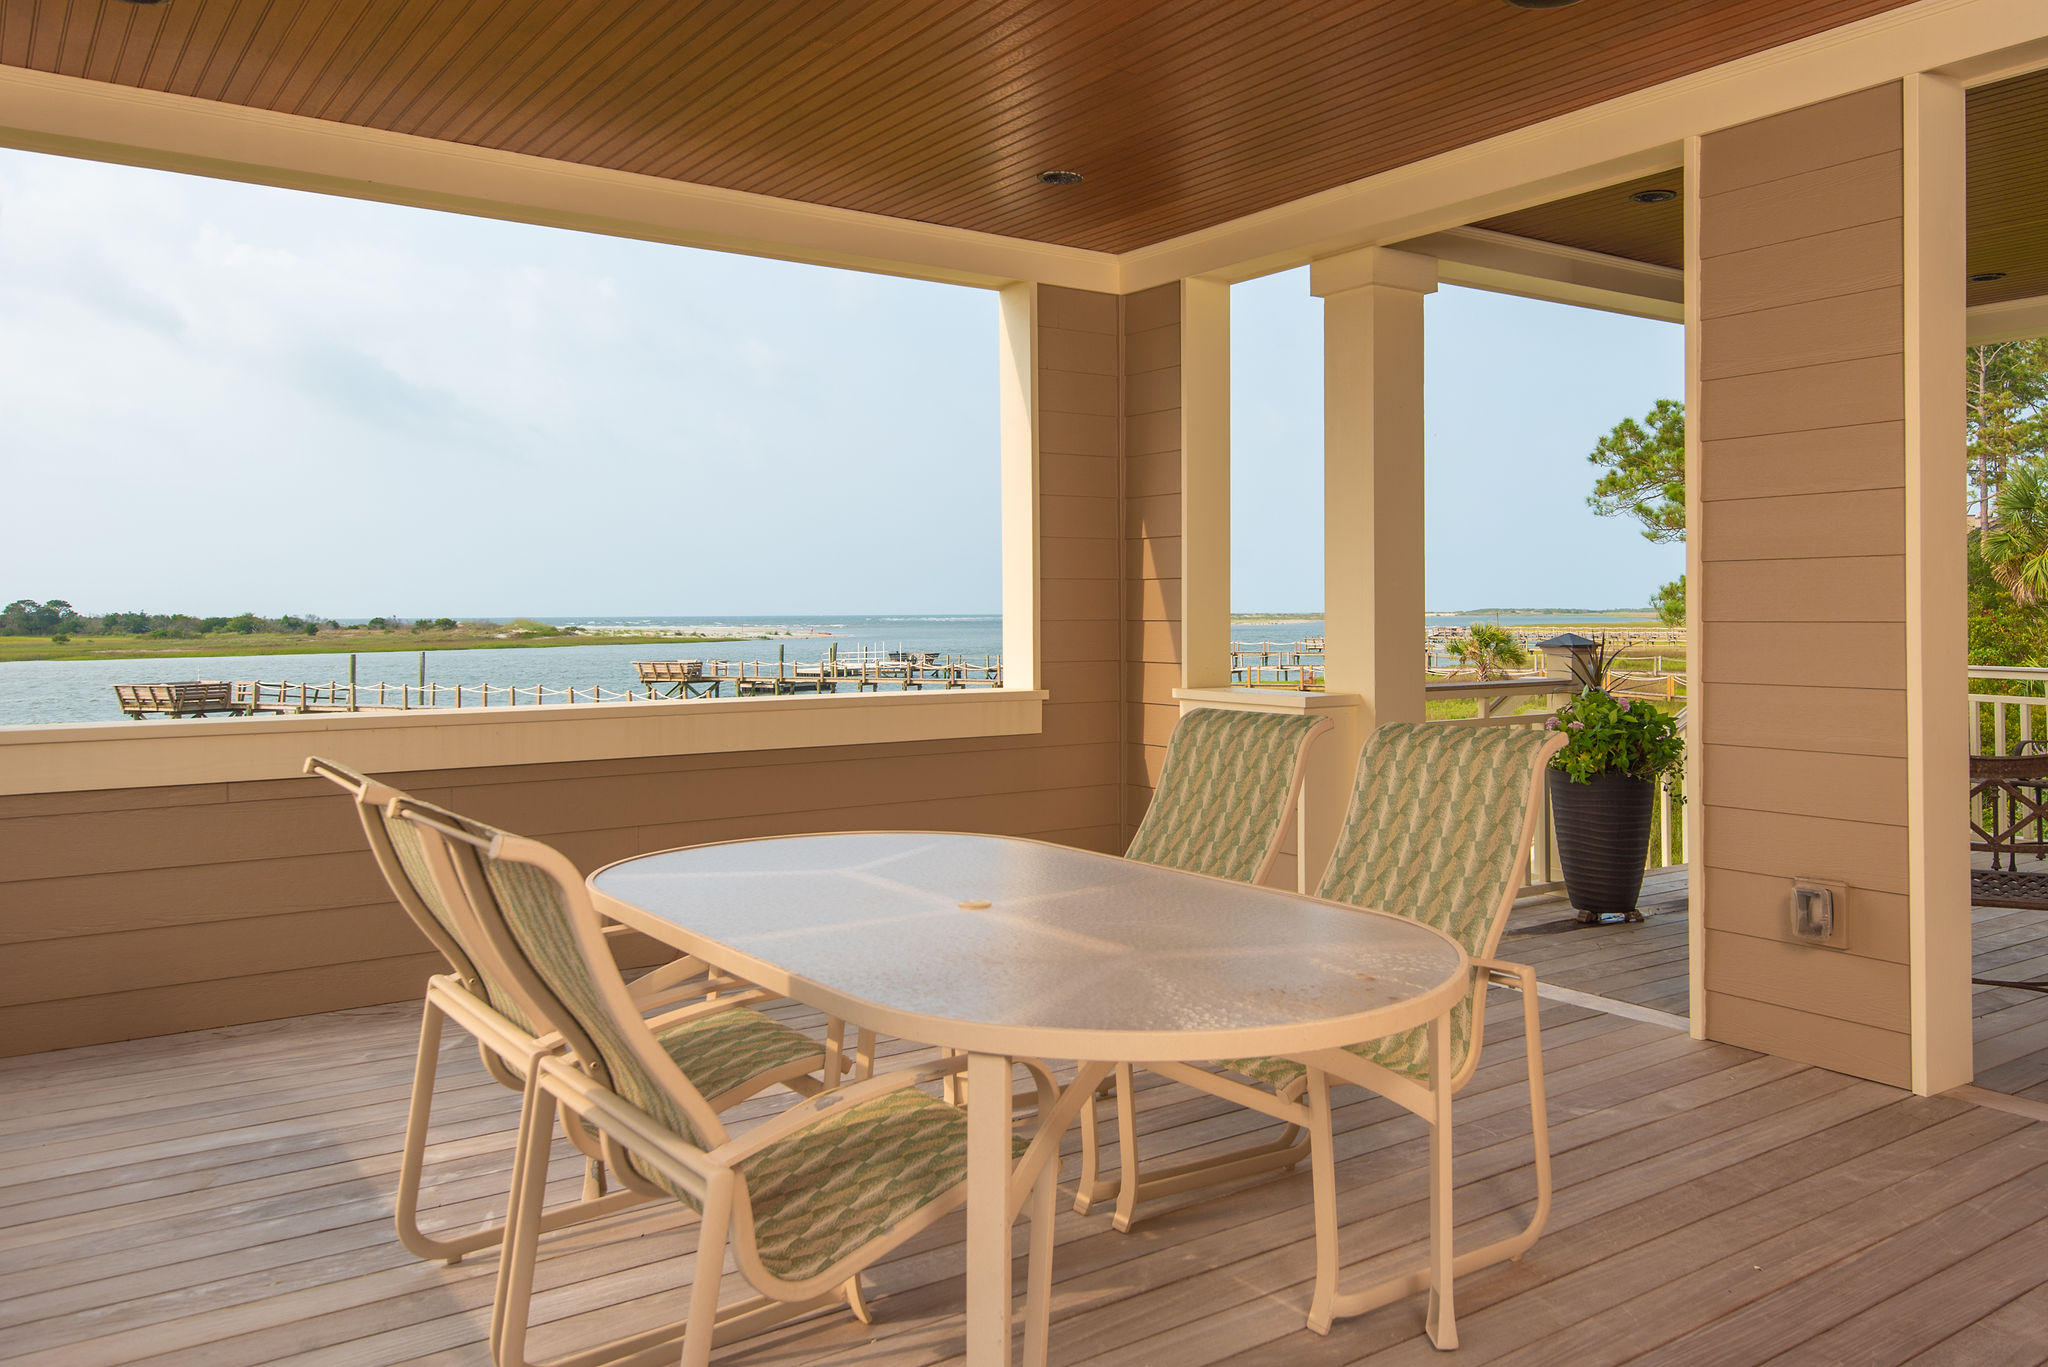 Seabrook Island Homes For Sale - 3135 Marshgate, Seabrook Island, SC - 27